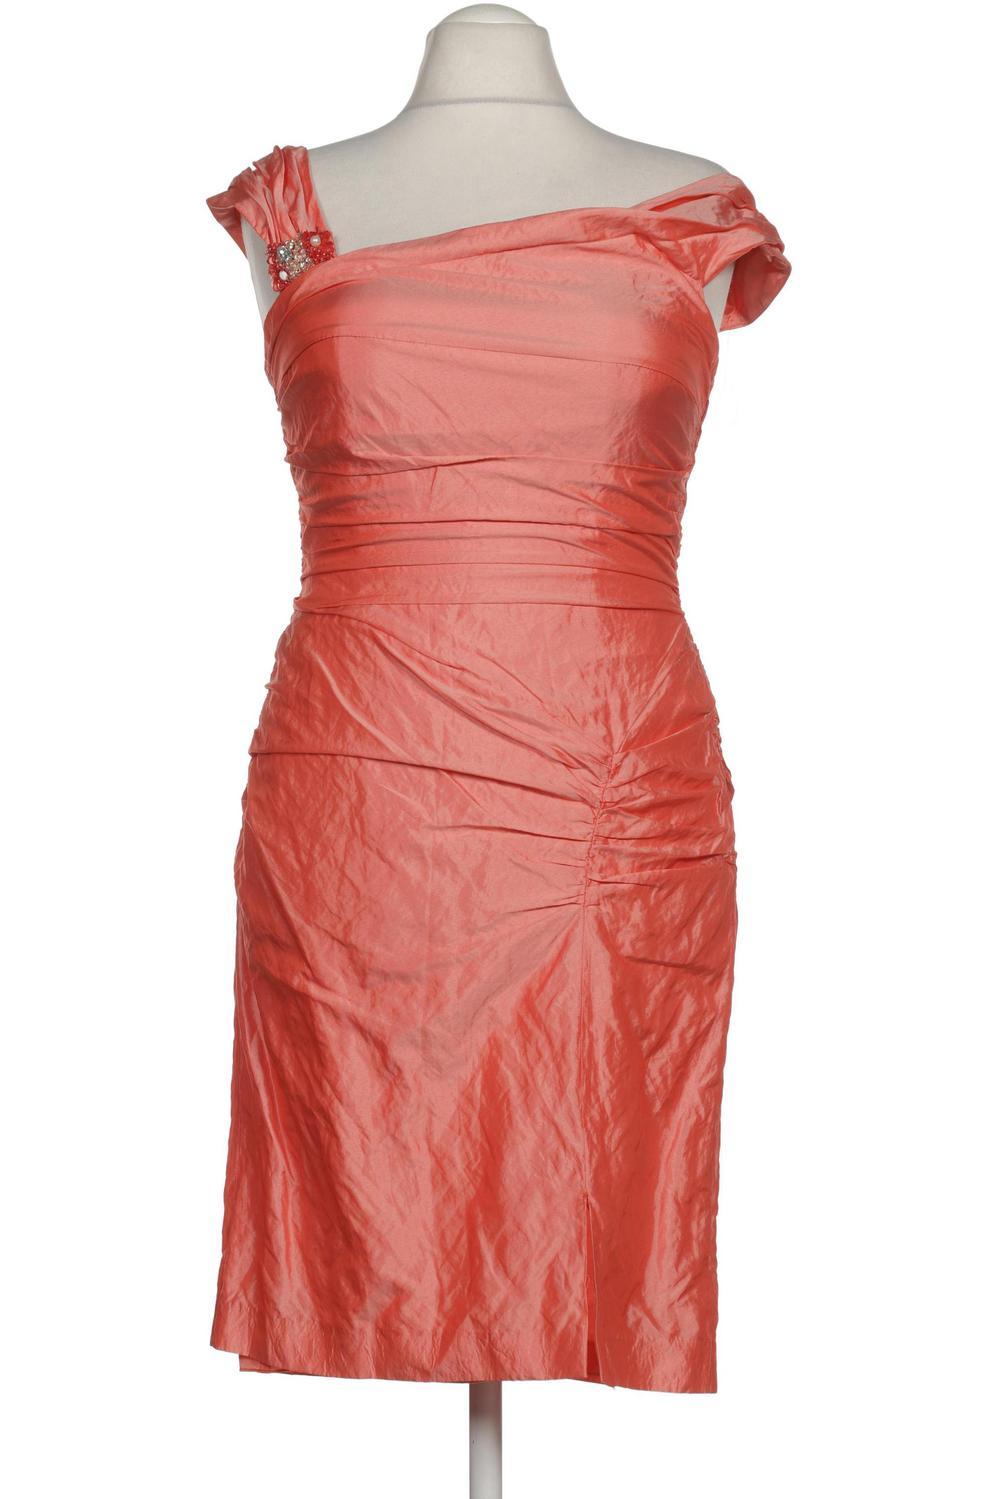 Vera Mont Kleid Damen Dress Damenkleid Gr. DE 40 Seide ...